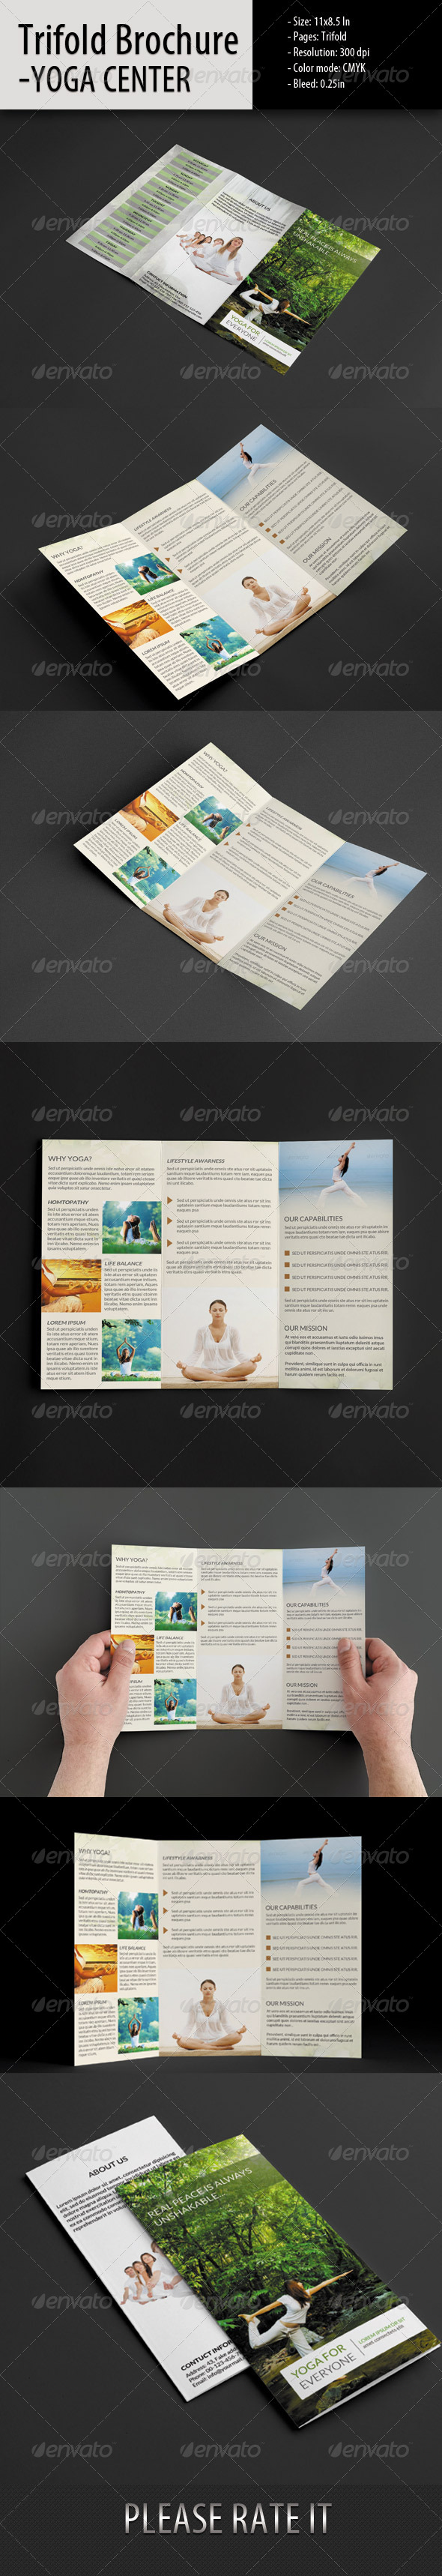 Trifold Brochure For Yoga Center